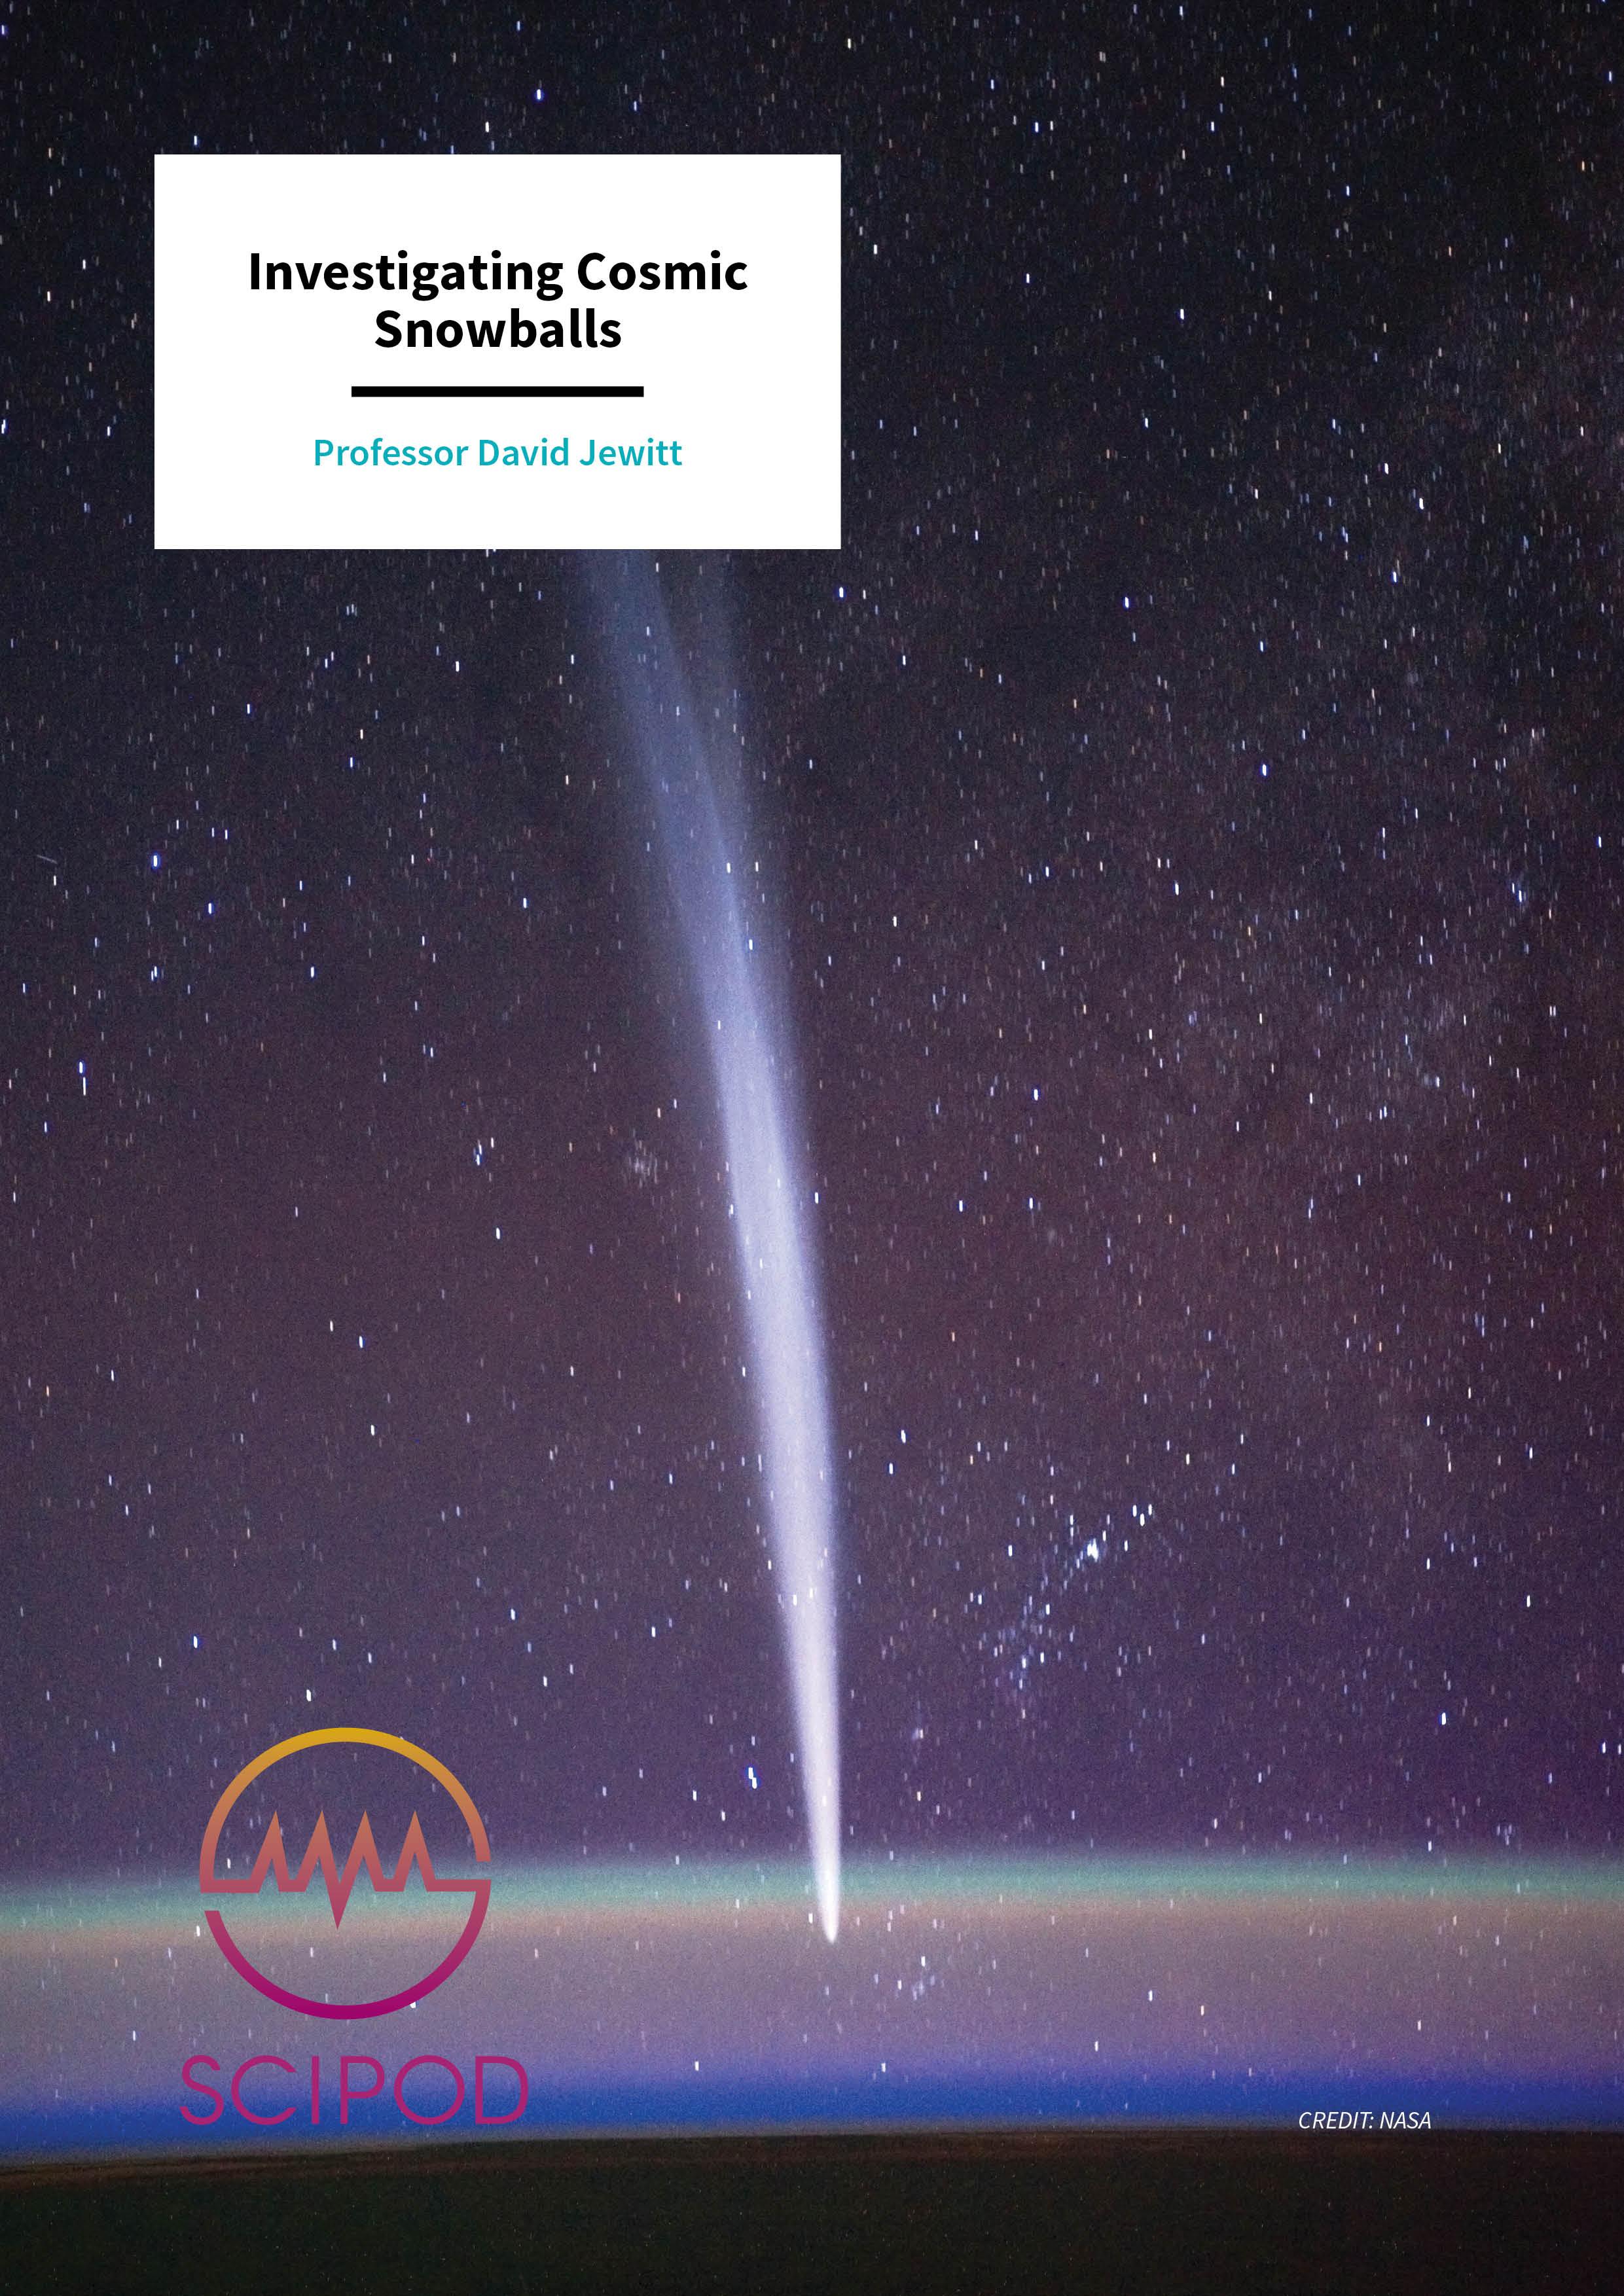 Investigating Cosmic Snowballs – Professor David Jewitt, University of California, Los Angeles